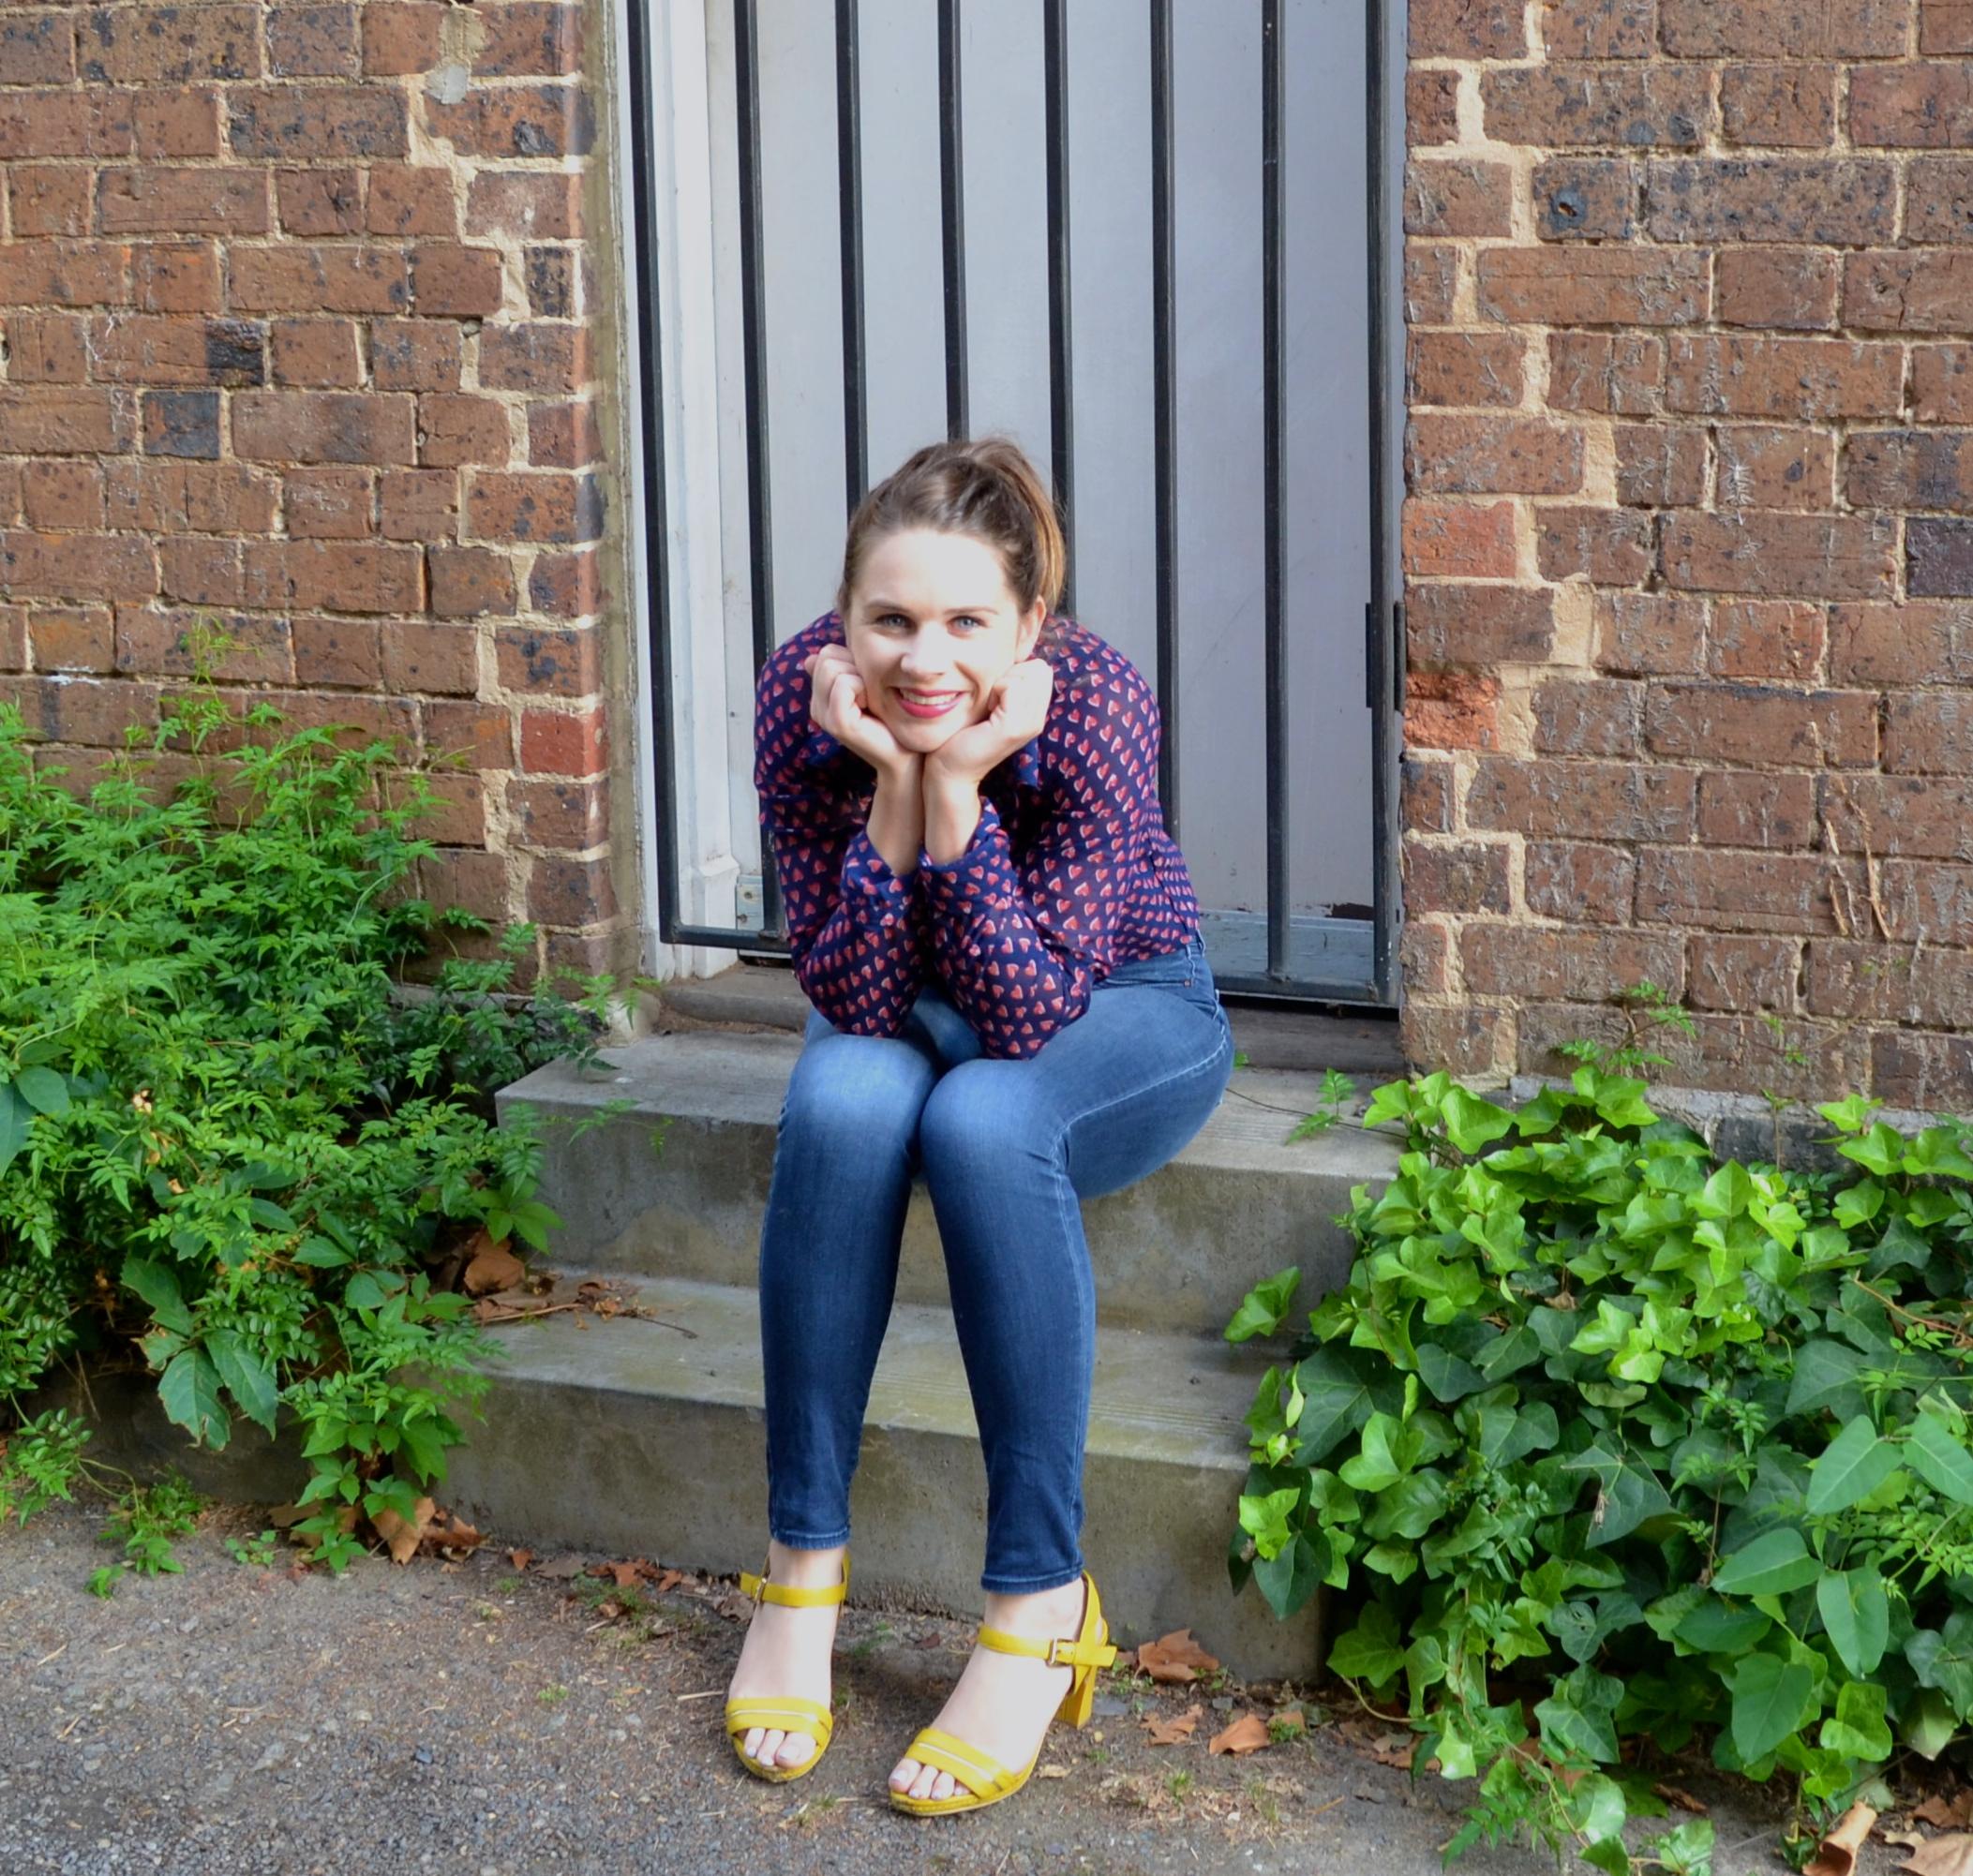 heart-blouse-jeans-brick-step